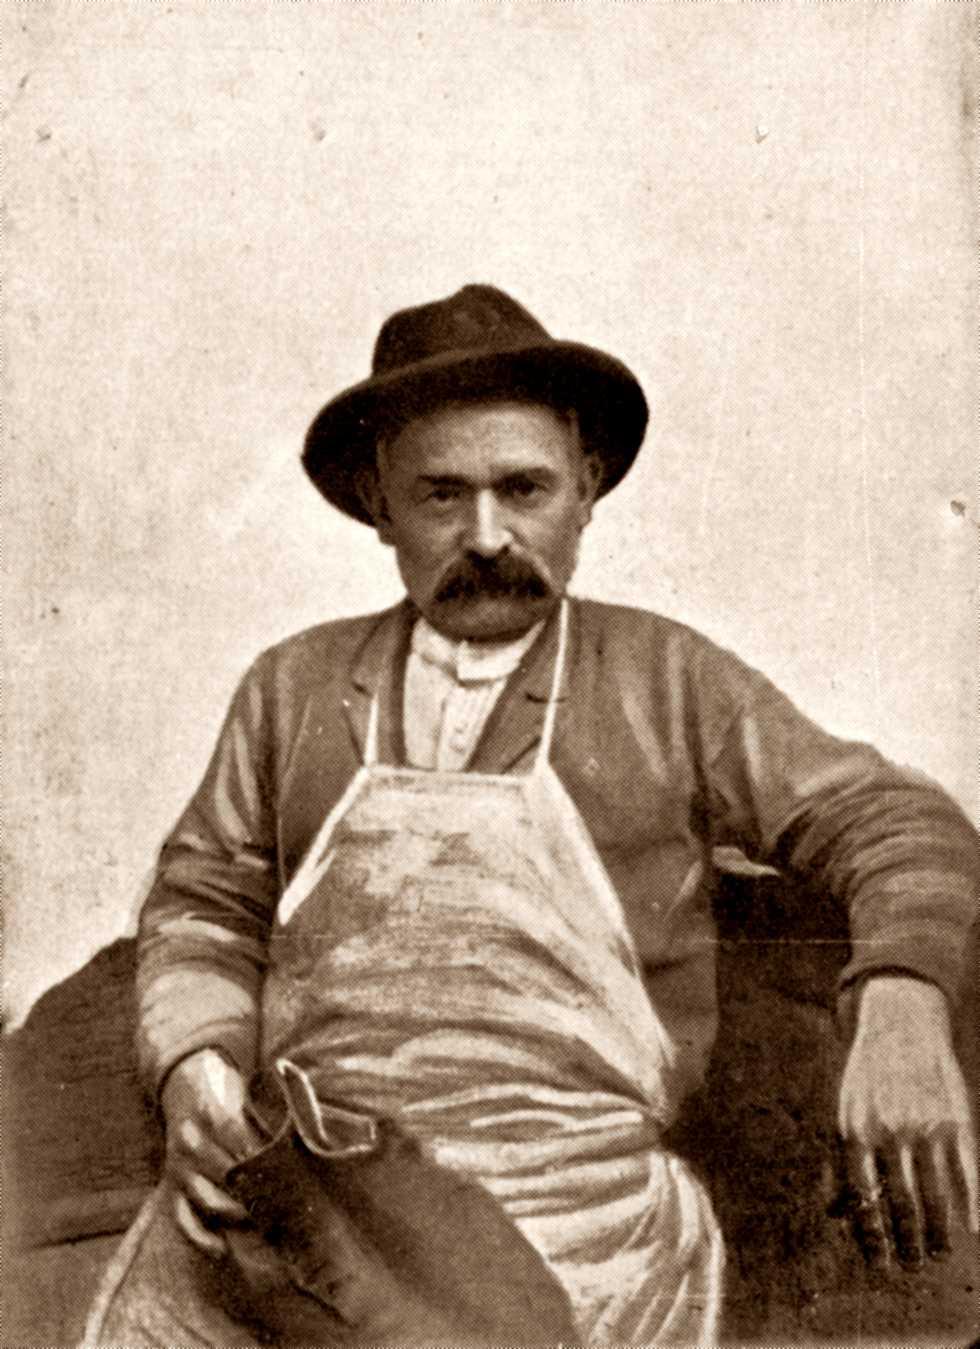 Adamo Mancini